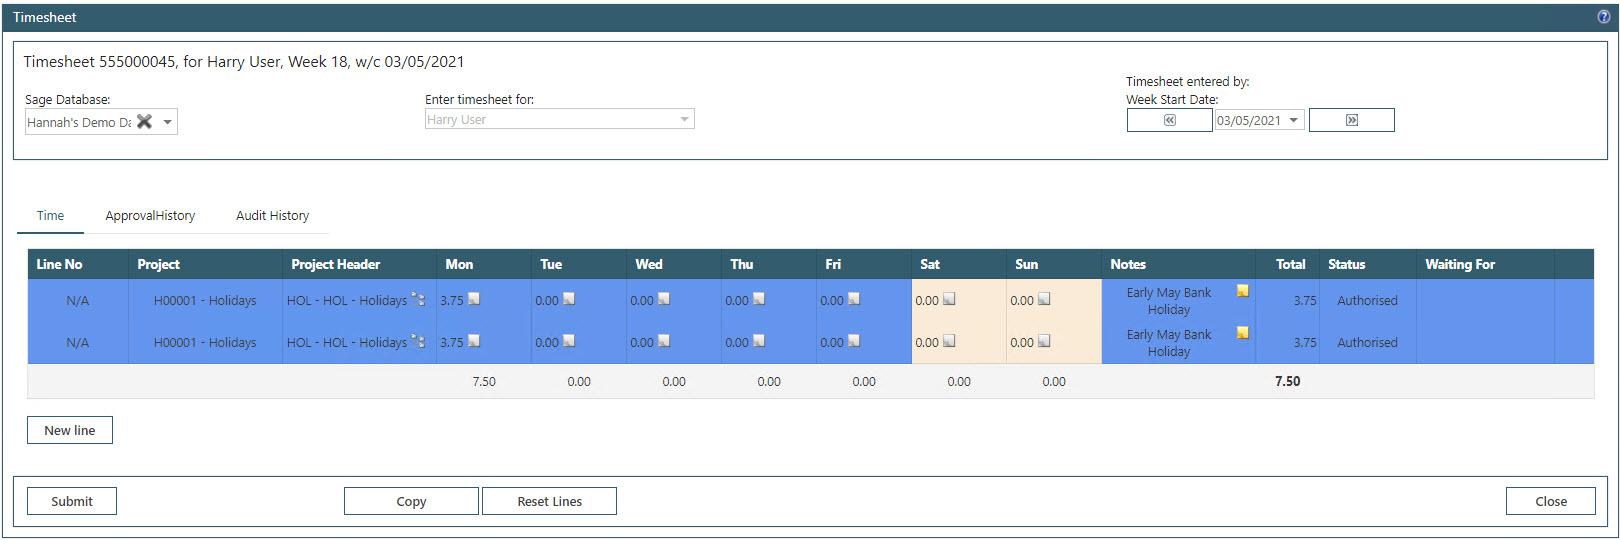 Sicon WAP Holidays Help and User Guide - WAP Holidays HUG Section 9.4 - Image 6